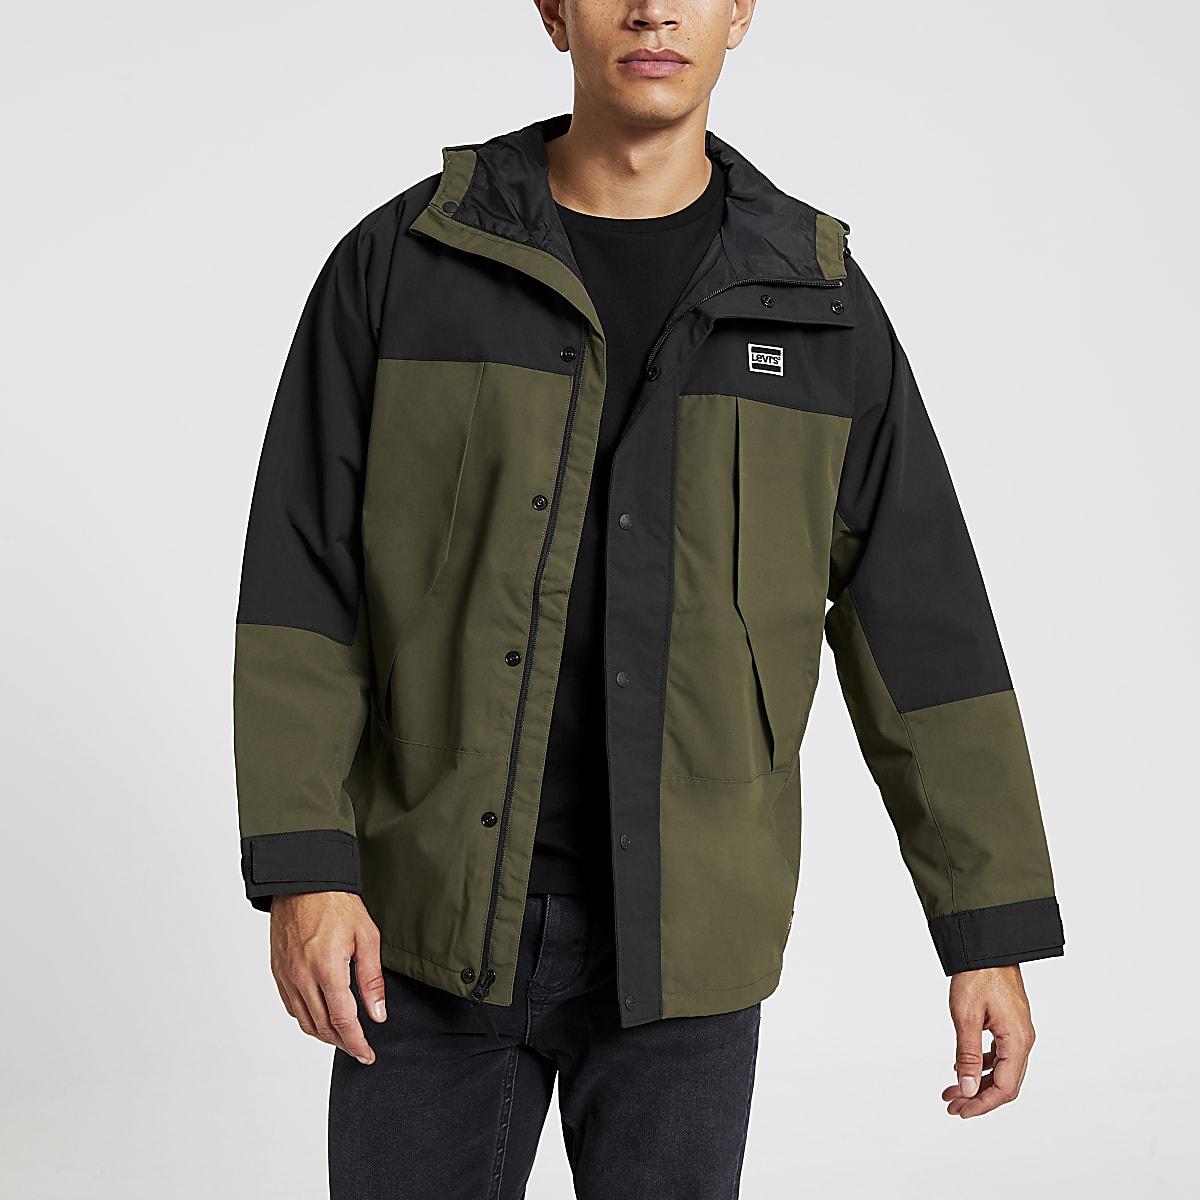 Levi's khaki lightweight blocked parka jacket